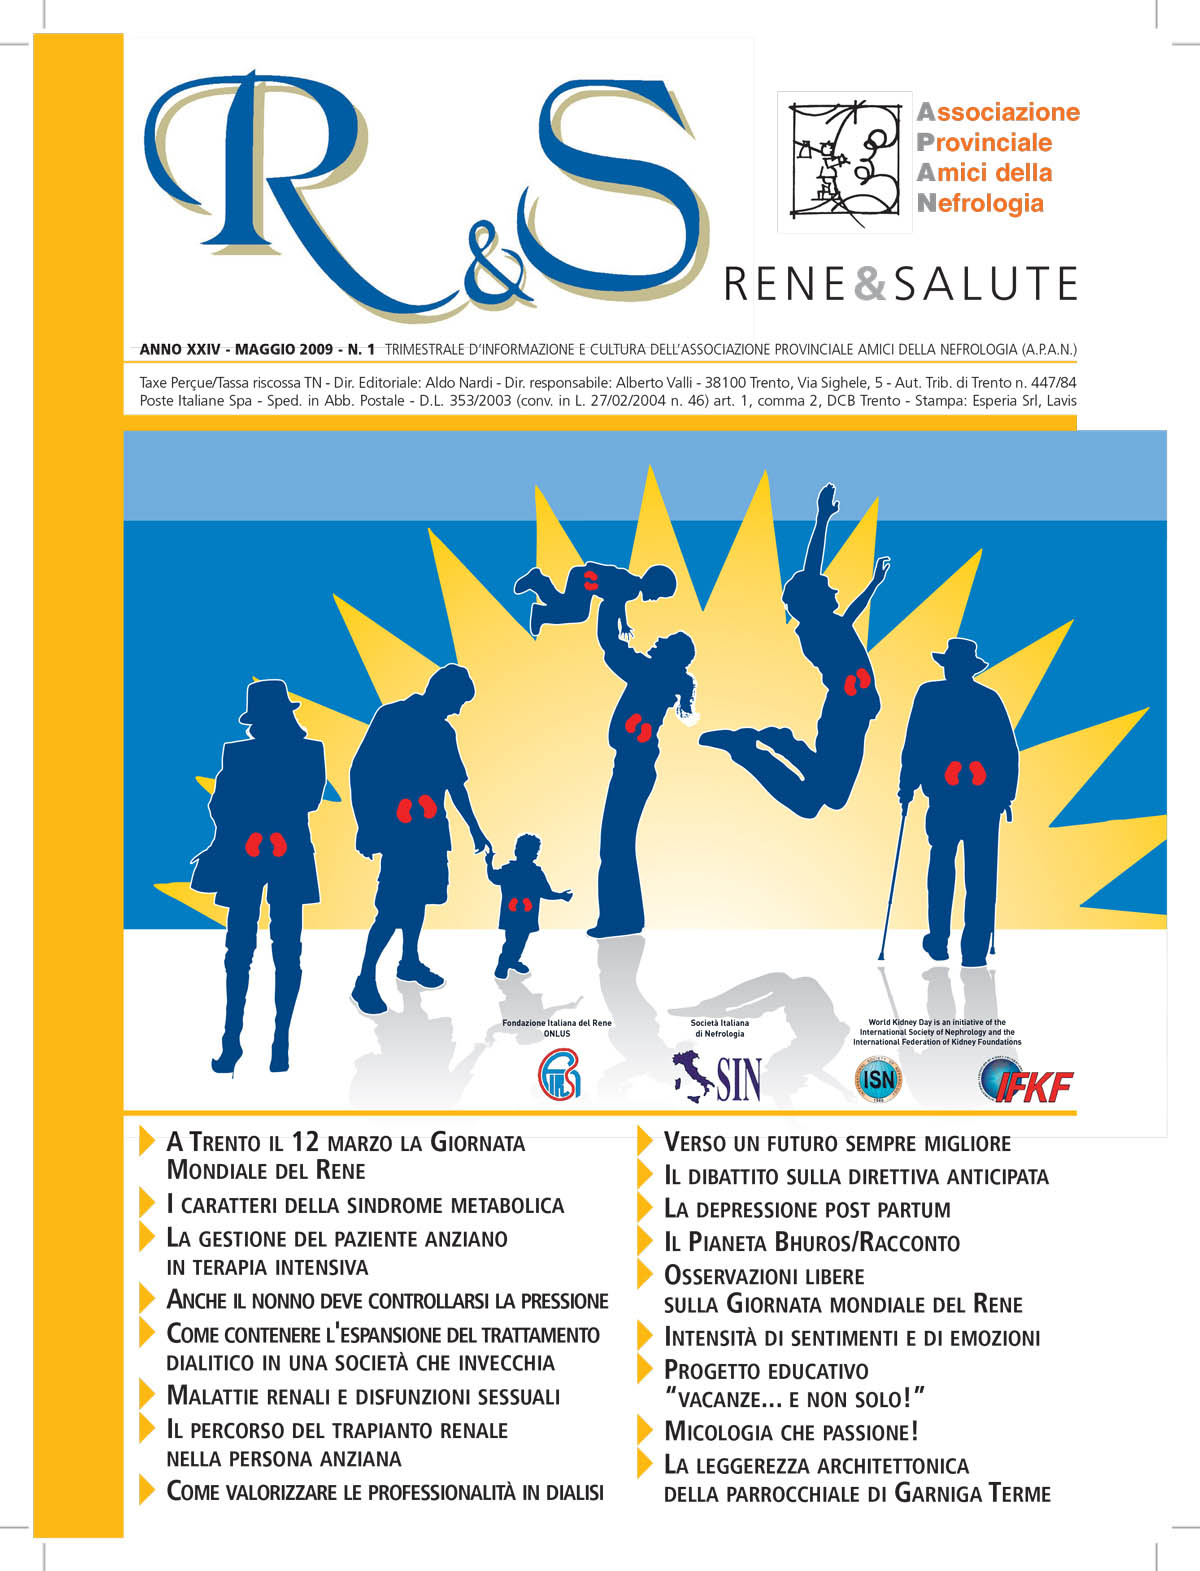 Rene & Salute 2009.1